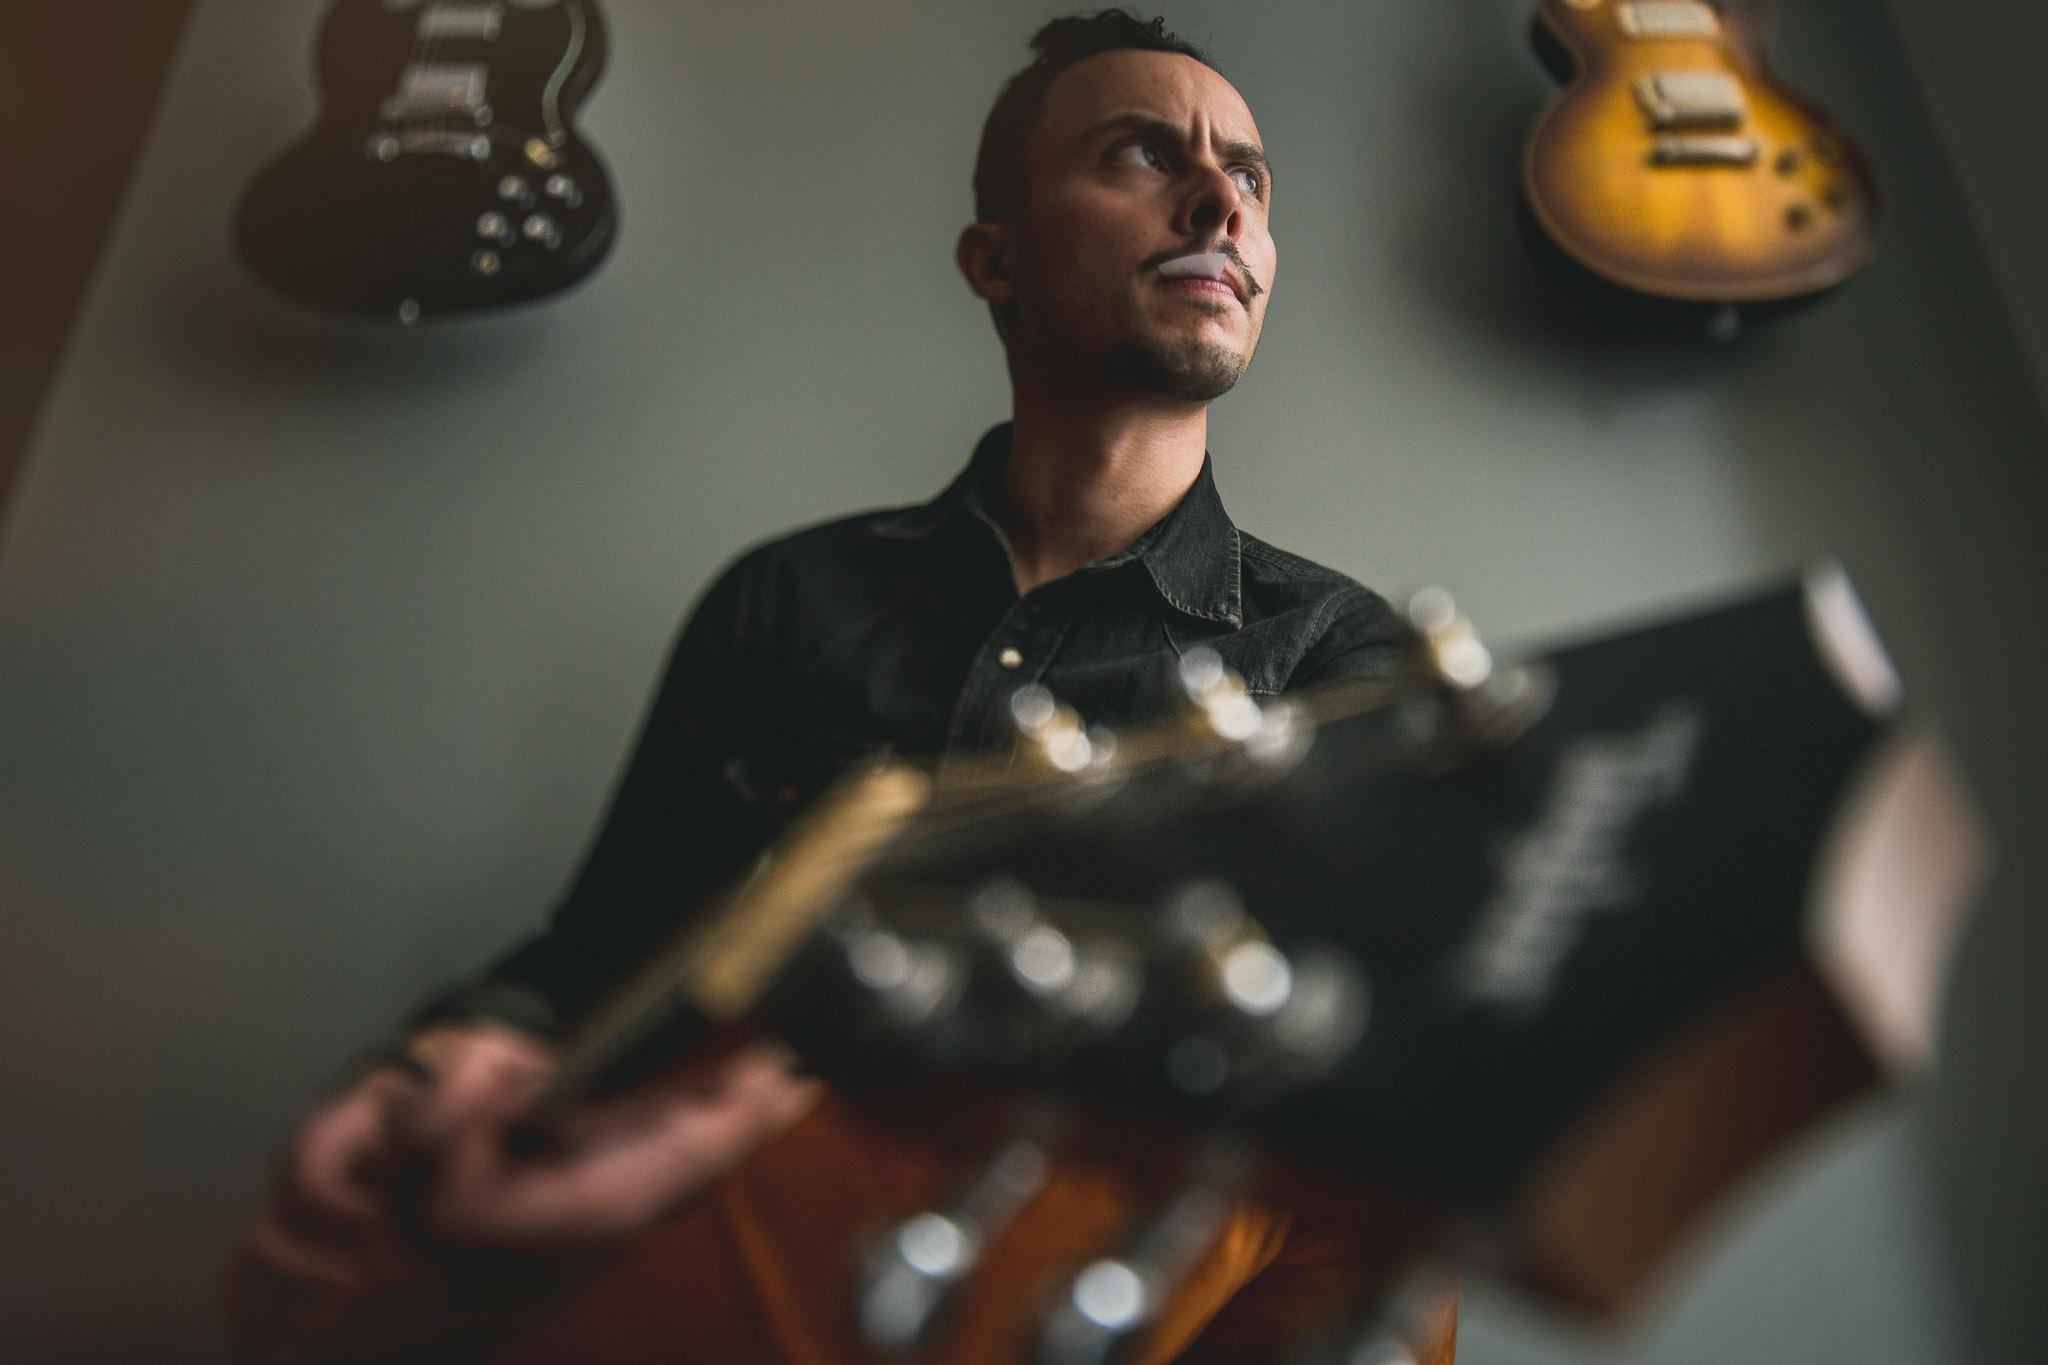 Taylor-guitar-advertising-portrait-brooks-hipster-fotografo-mexico-retrato-MaurizioSolisBroca.Photography150706DSC02978-Edit.jpg